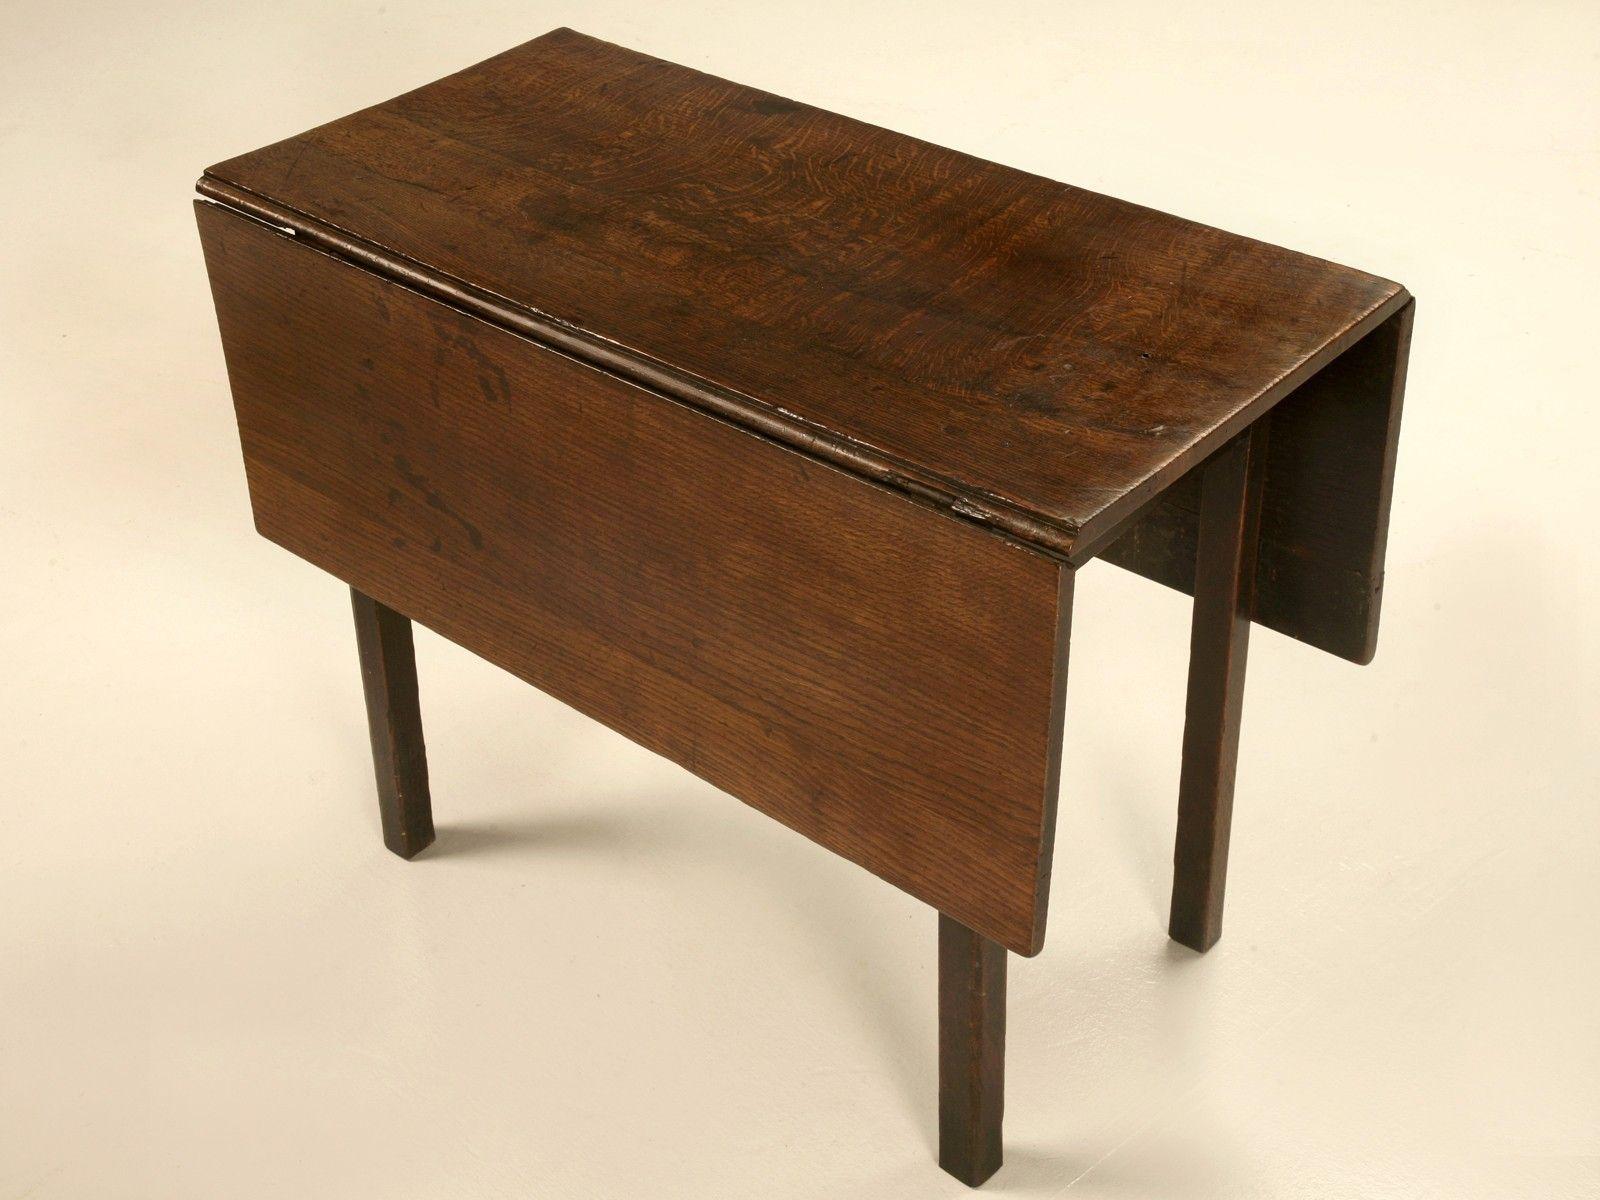 Best Of Wood Drop Leaf Tables Epic Wood Drop Leaf Tables 34 On